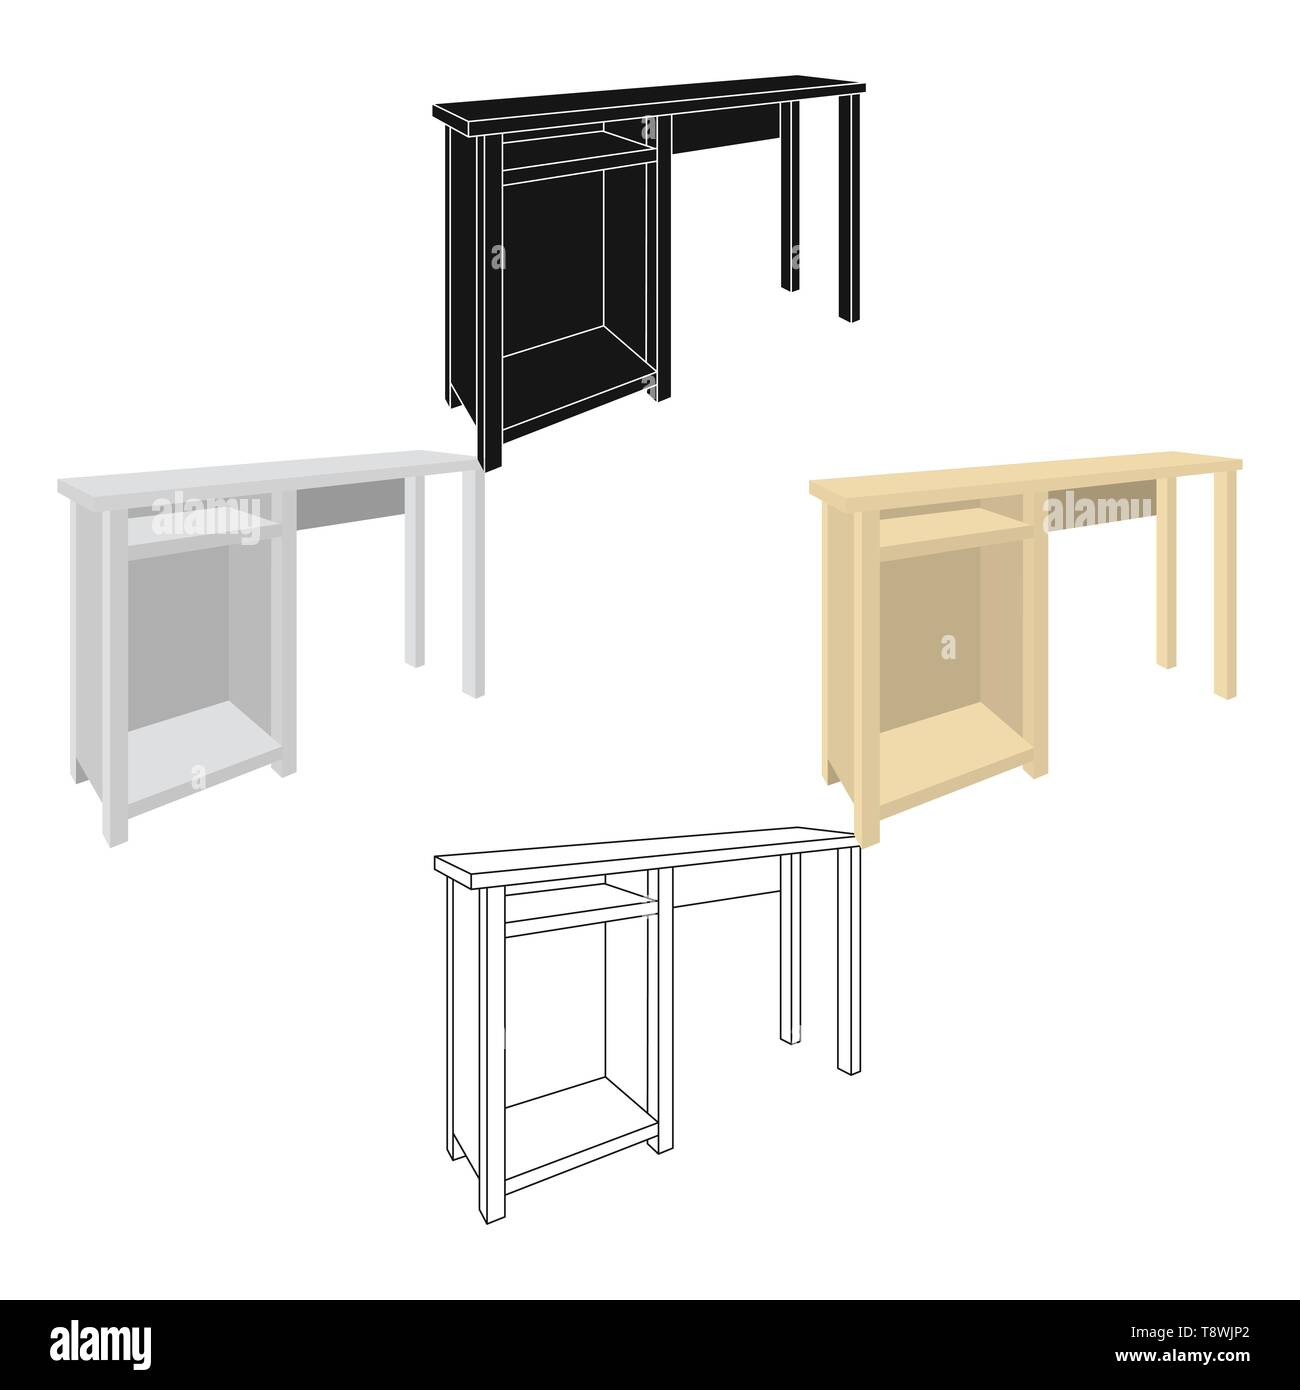 app to draw interior design sketches